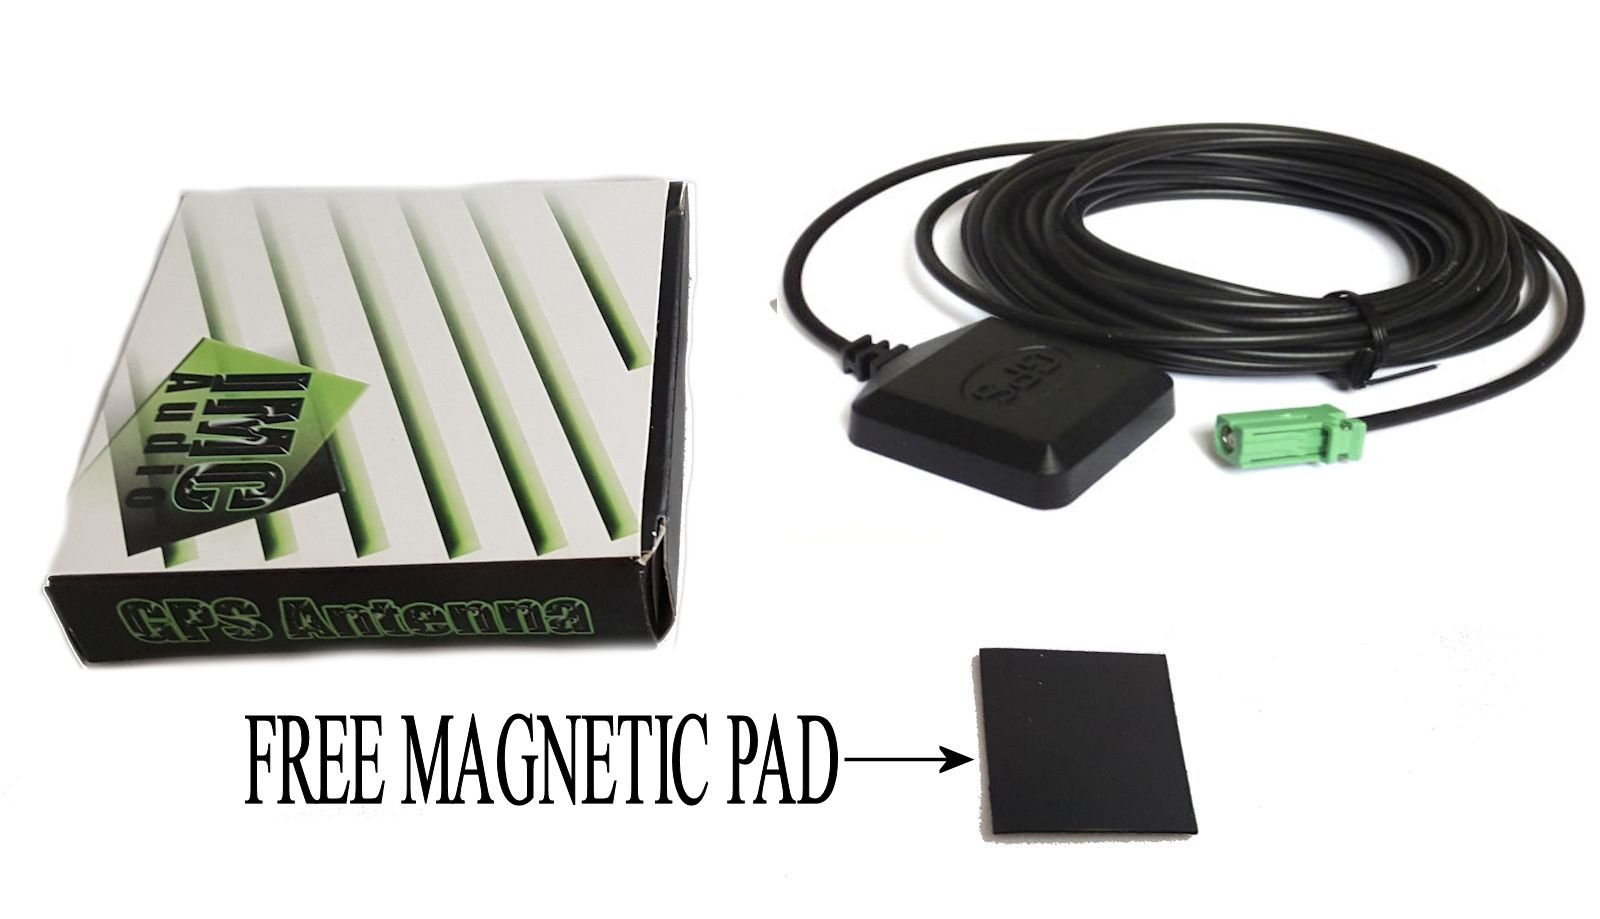 IMC Audio Pioneer GPS Navigation Antenna For AVIC-5000NEX 6000NEX 7000NEX 8000NEX U200 SPH-DA110 SPH-DA210